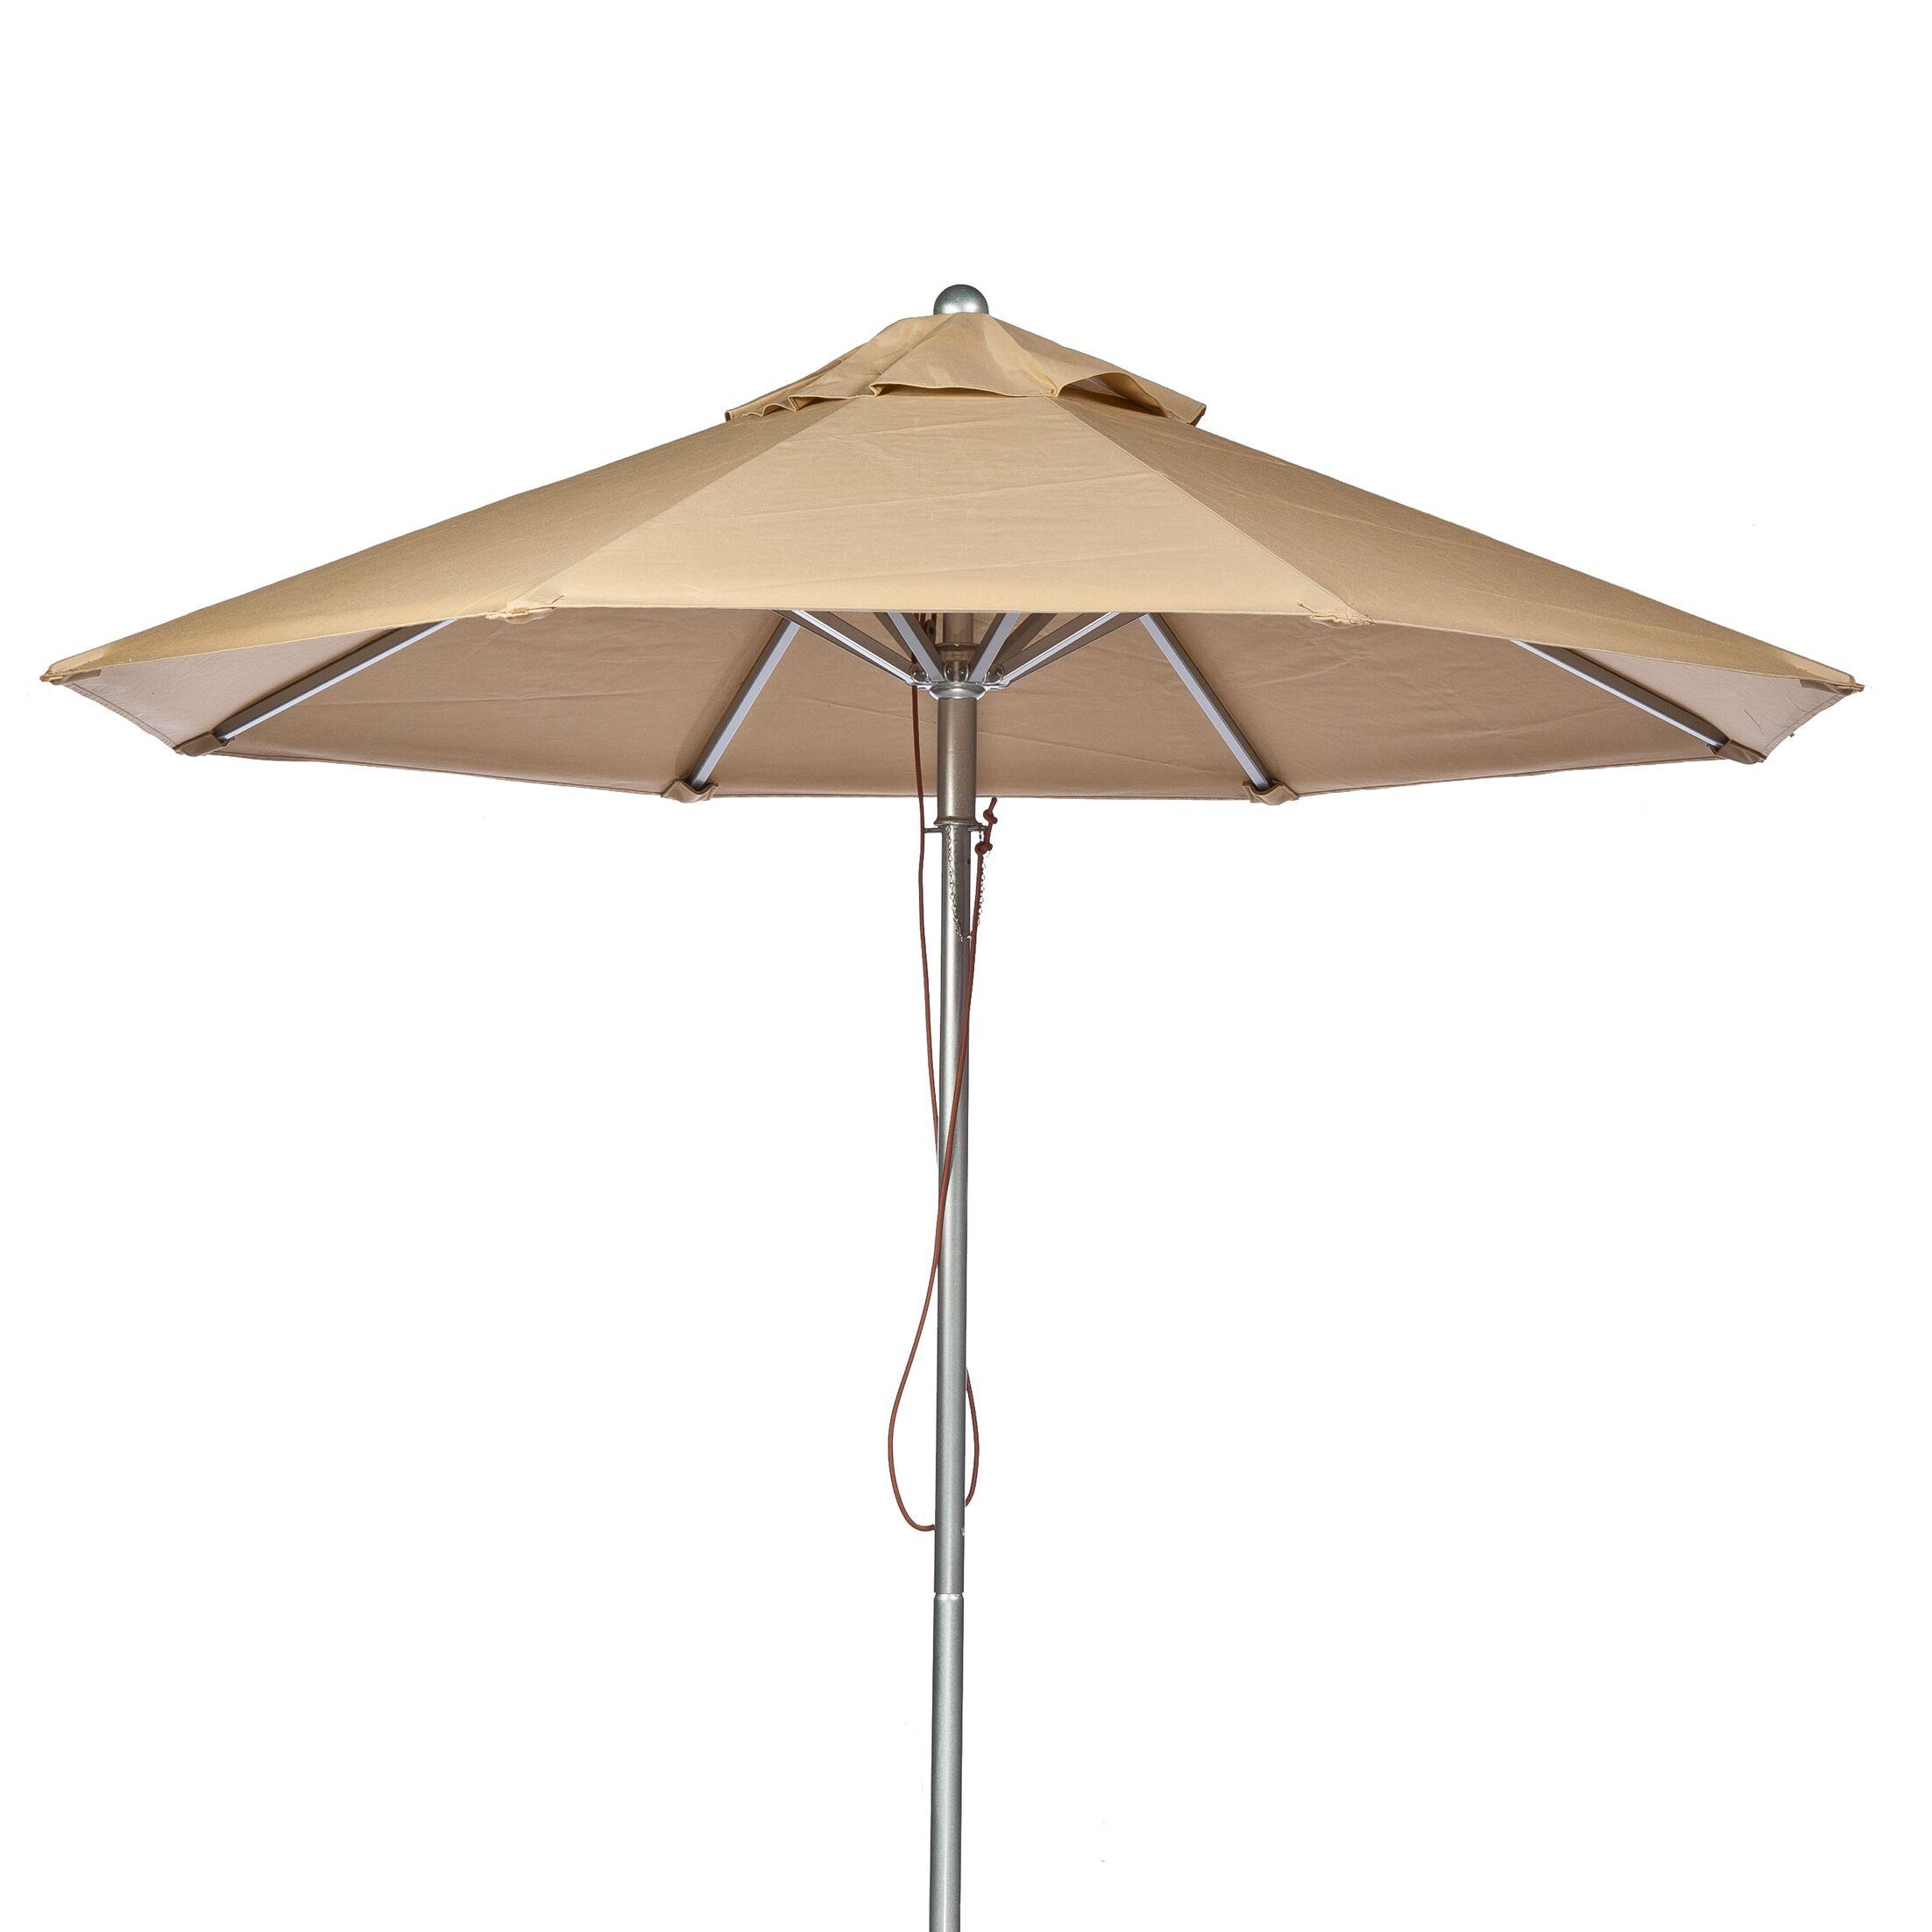 7.5' Market Umbrella Fabric: Toast